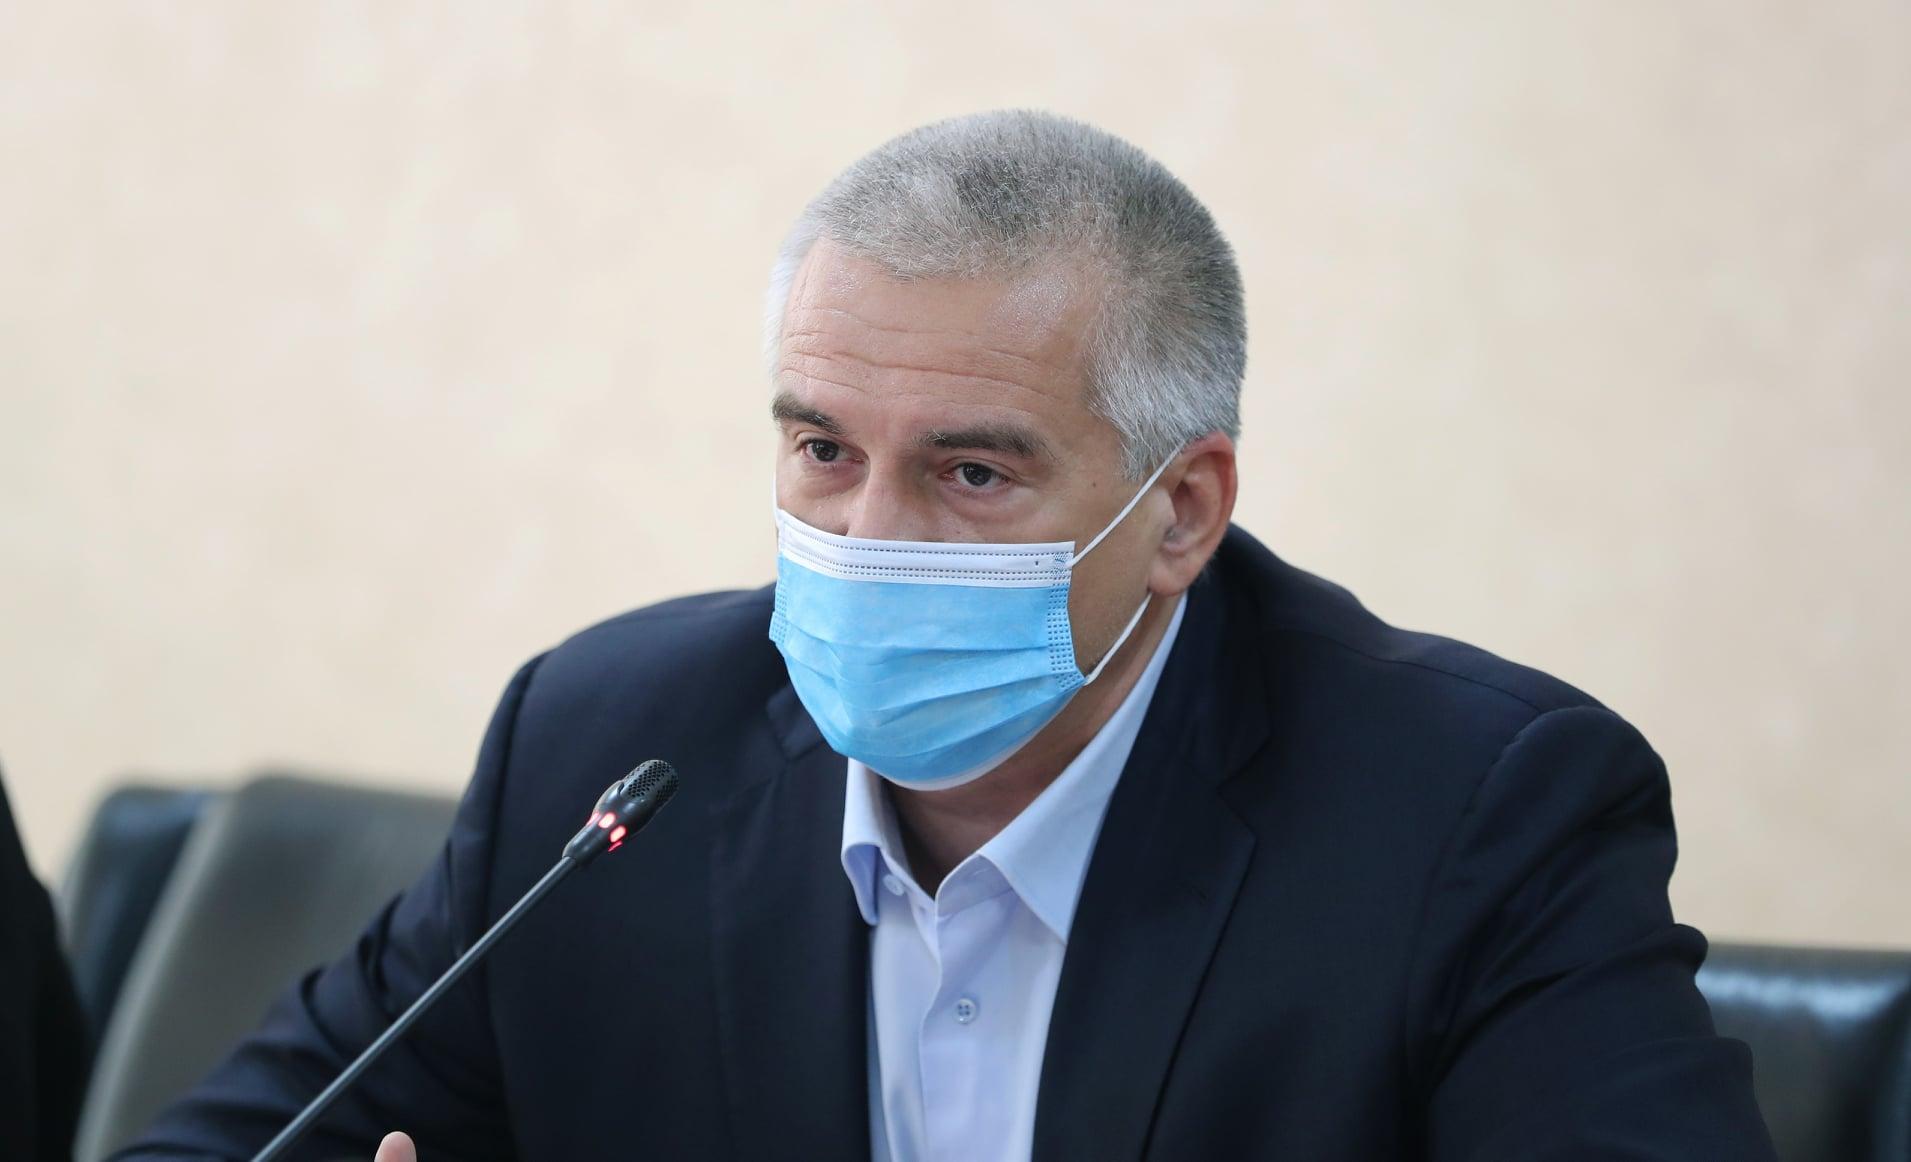 Аксенов рассказал, в связи с чем силовики проверяют администрацию Керчи